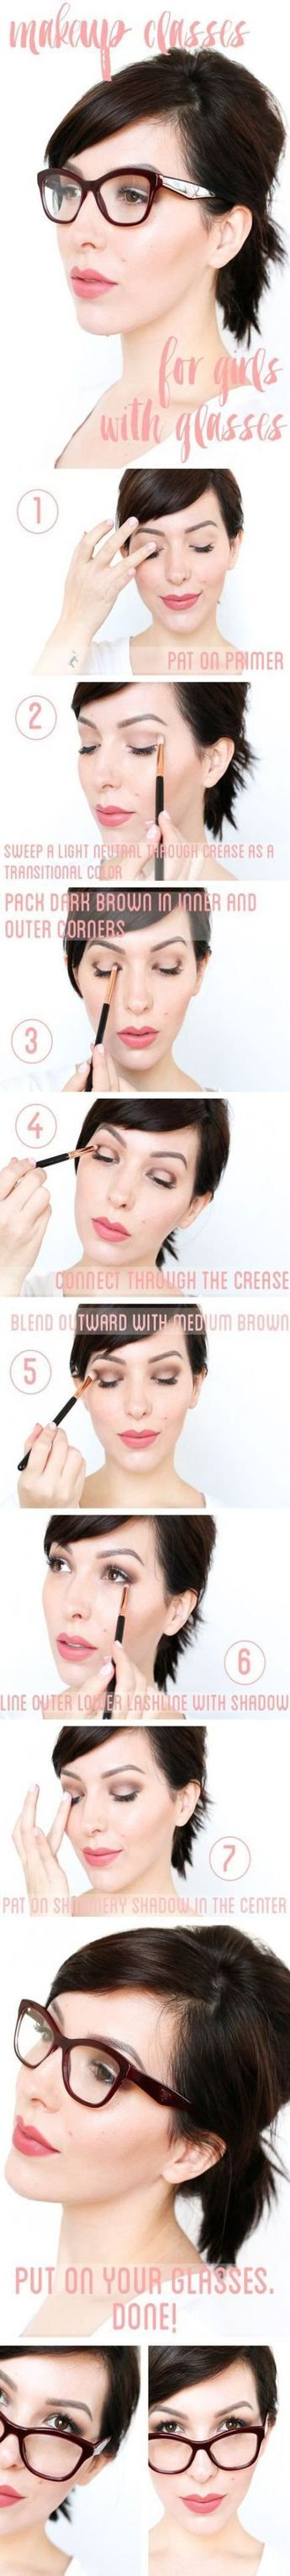 #glasses  #makeup #Makeup #Tips #For  Makeup Tips For Glasses Make Up Dr. Who 47+ Ideas